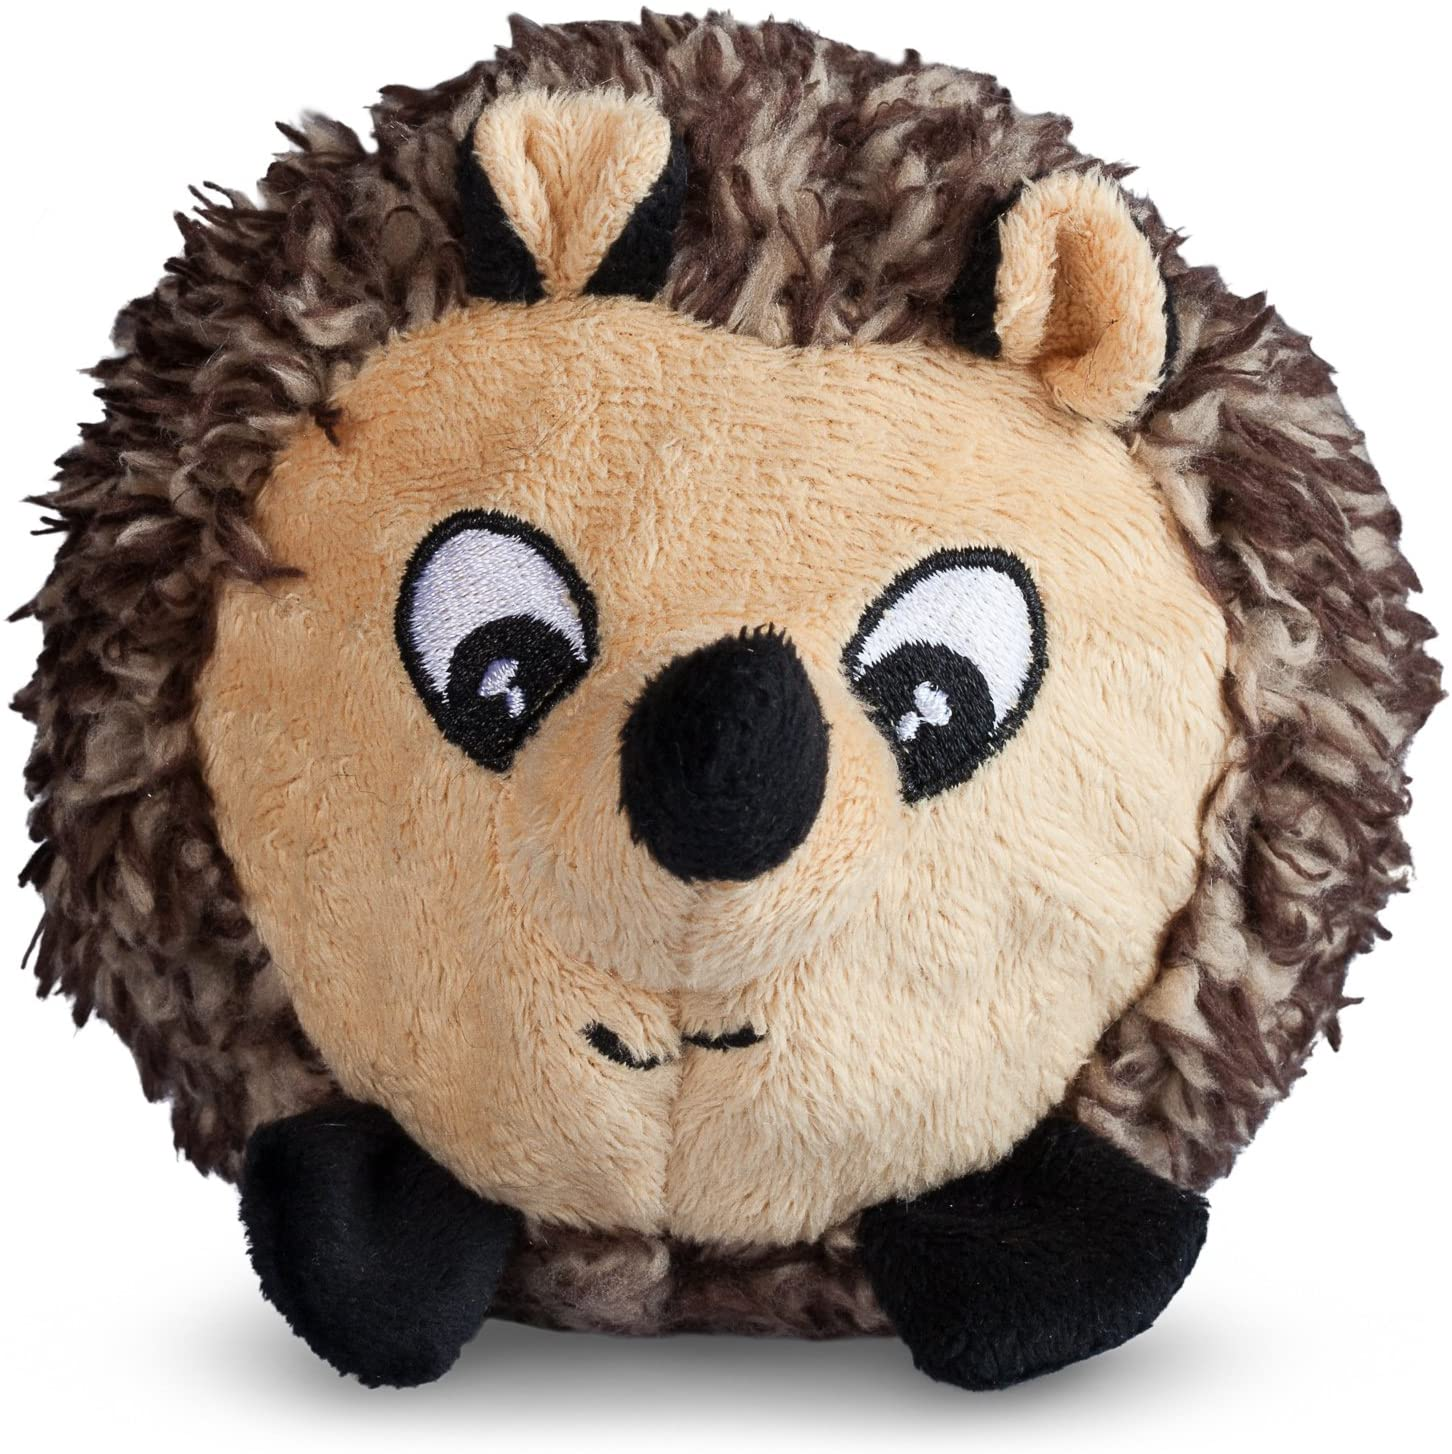 fabdog Faball Dog Toy, Hedgehog, Small